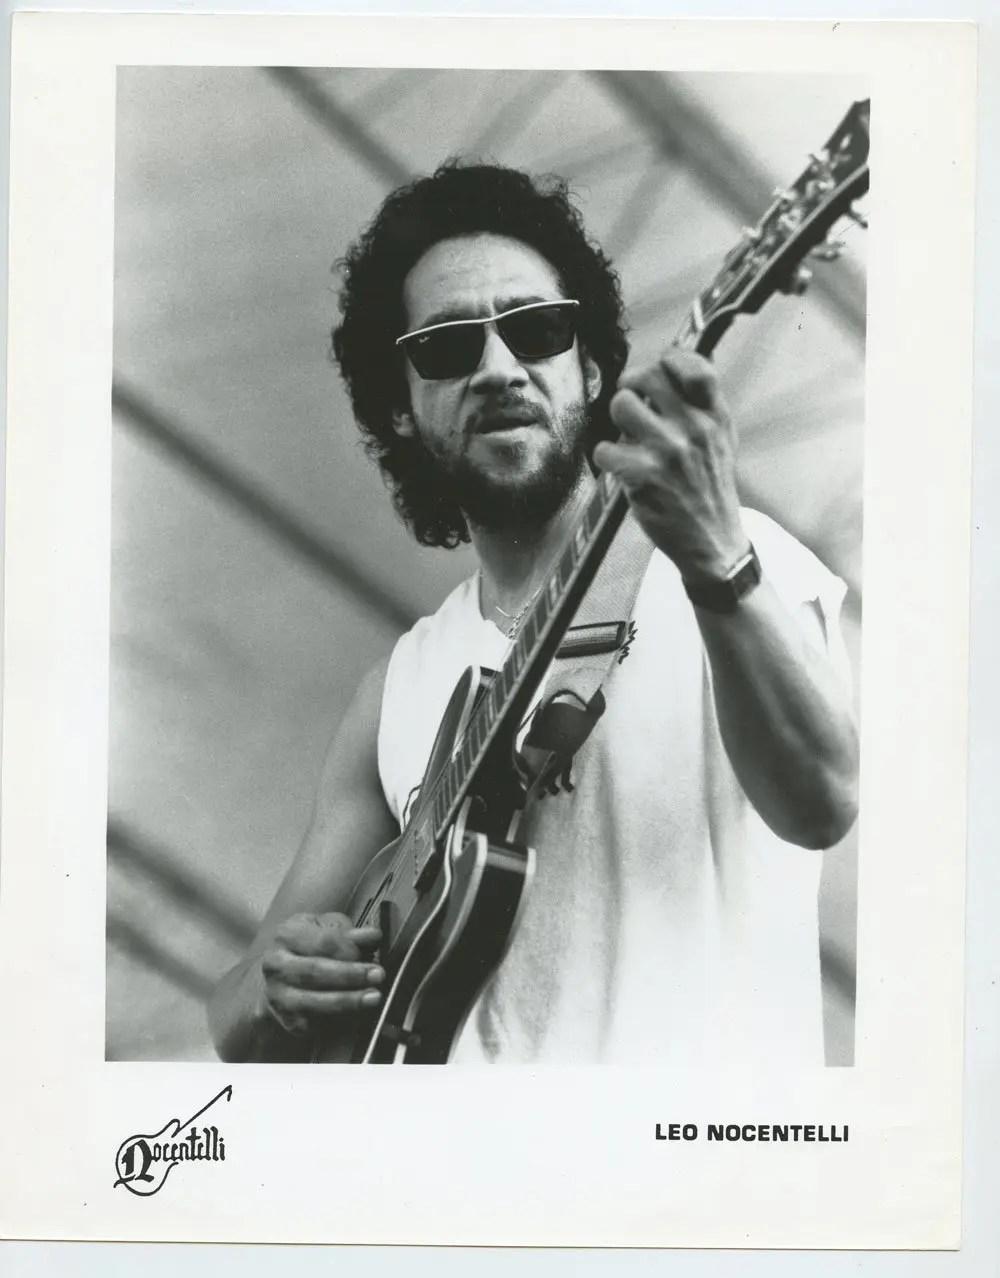 Leo Nocentelli Photo 1990s Publicity Promo